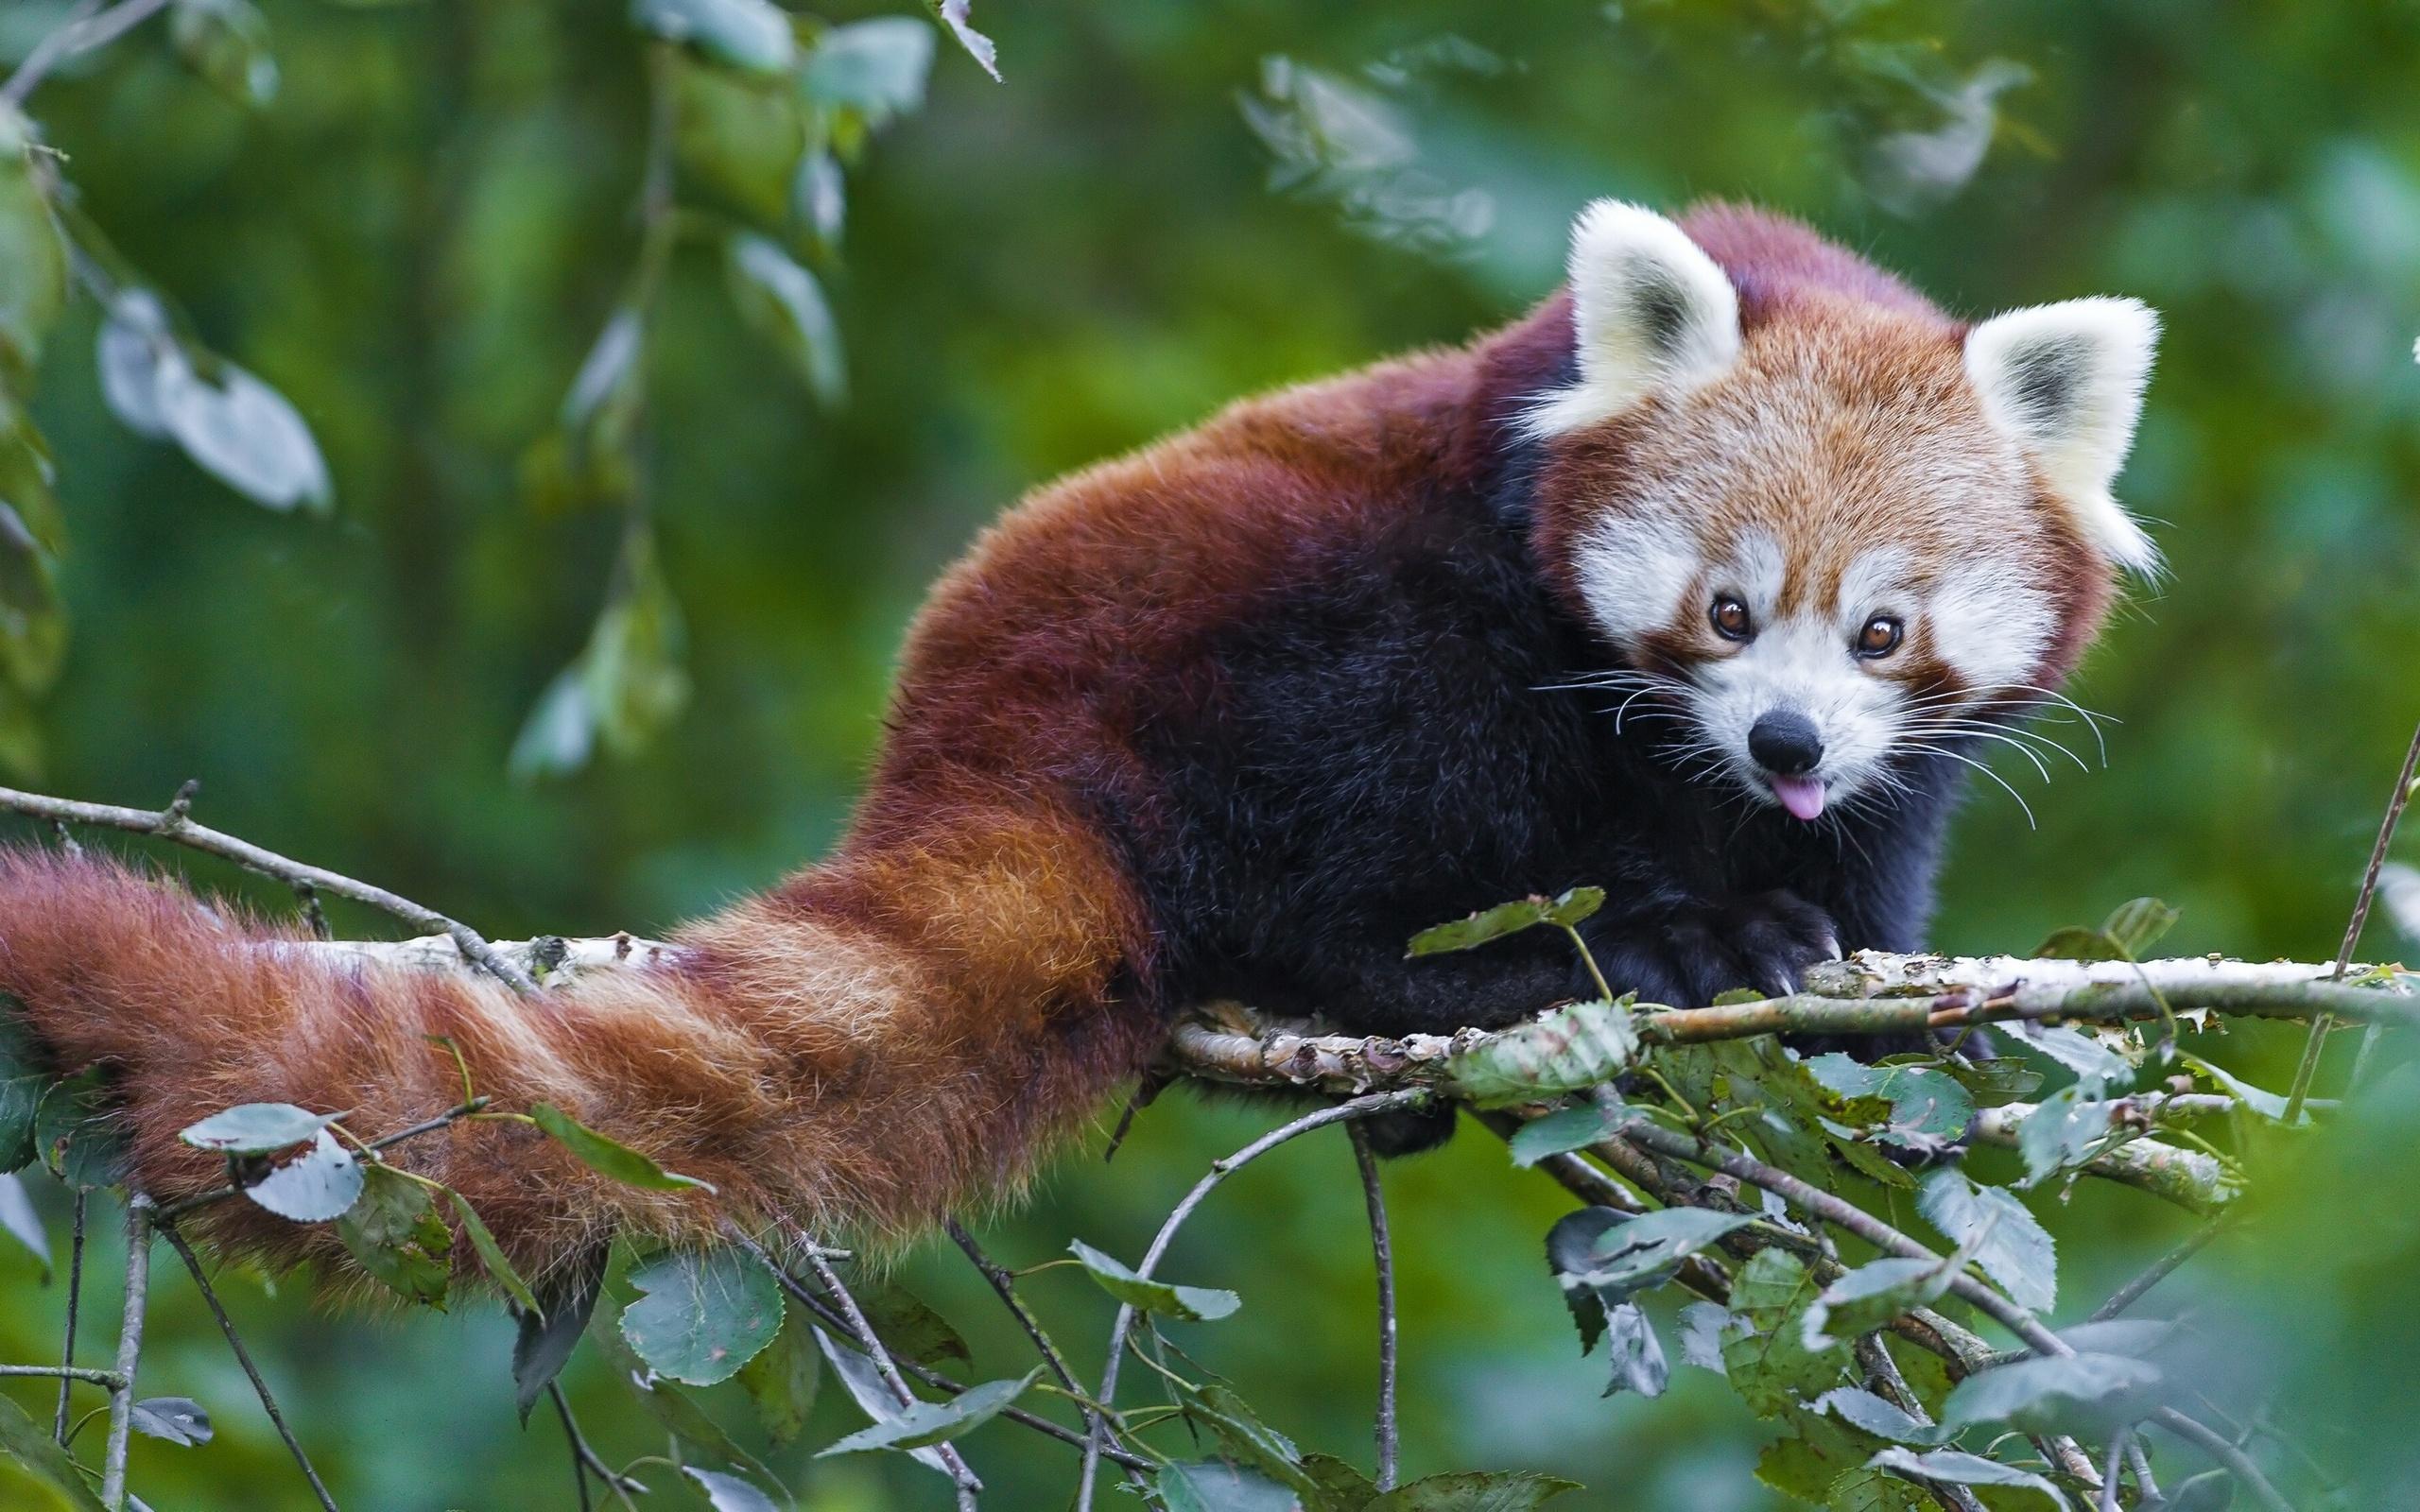 Cute Red Panda wallpaper   ForWallpapercom 2560x1600